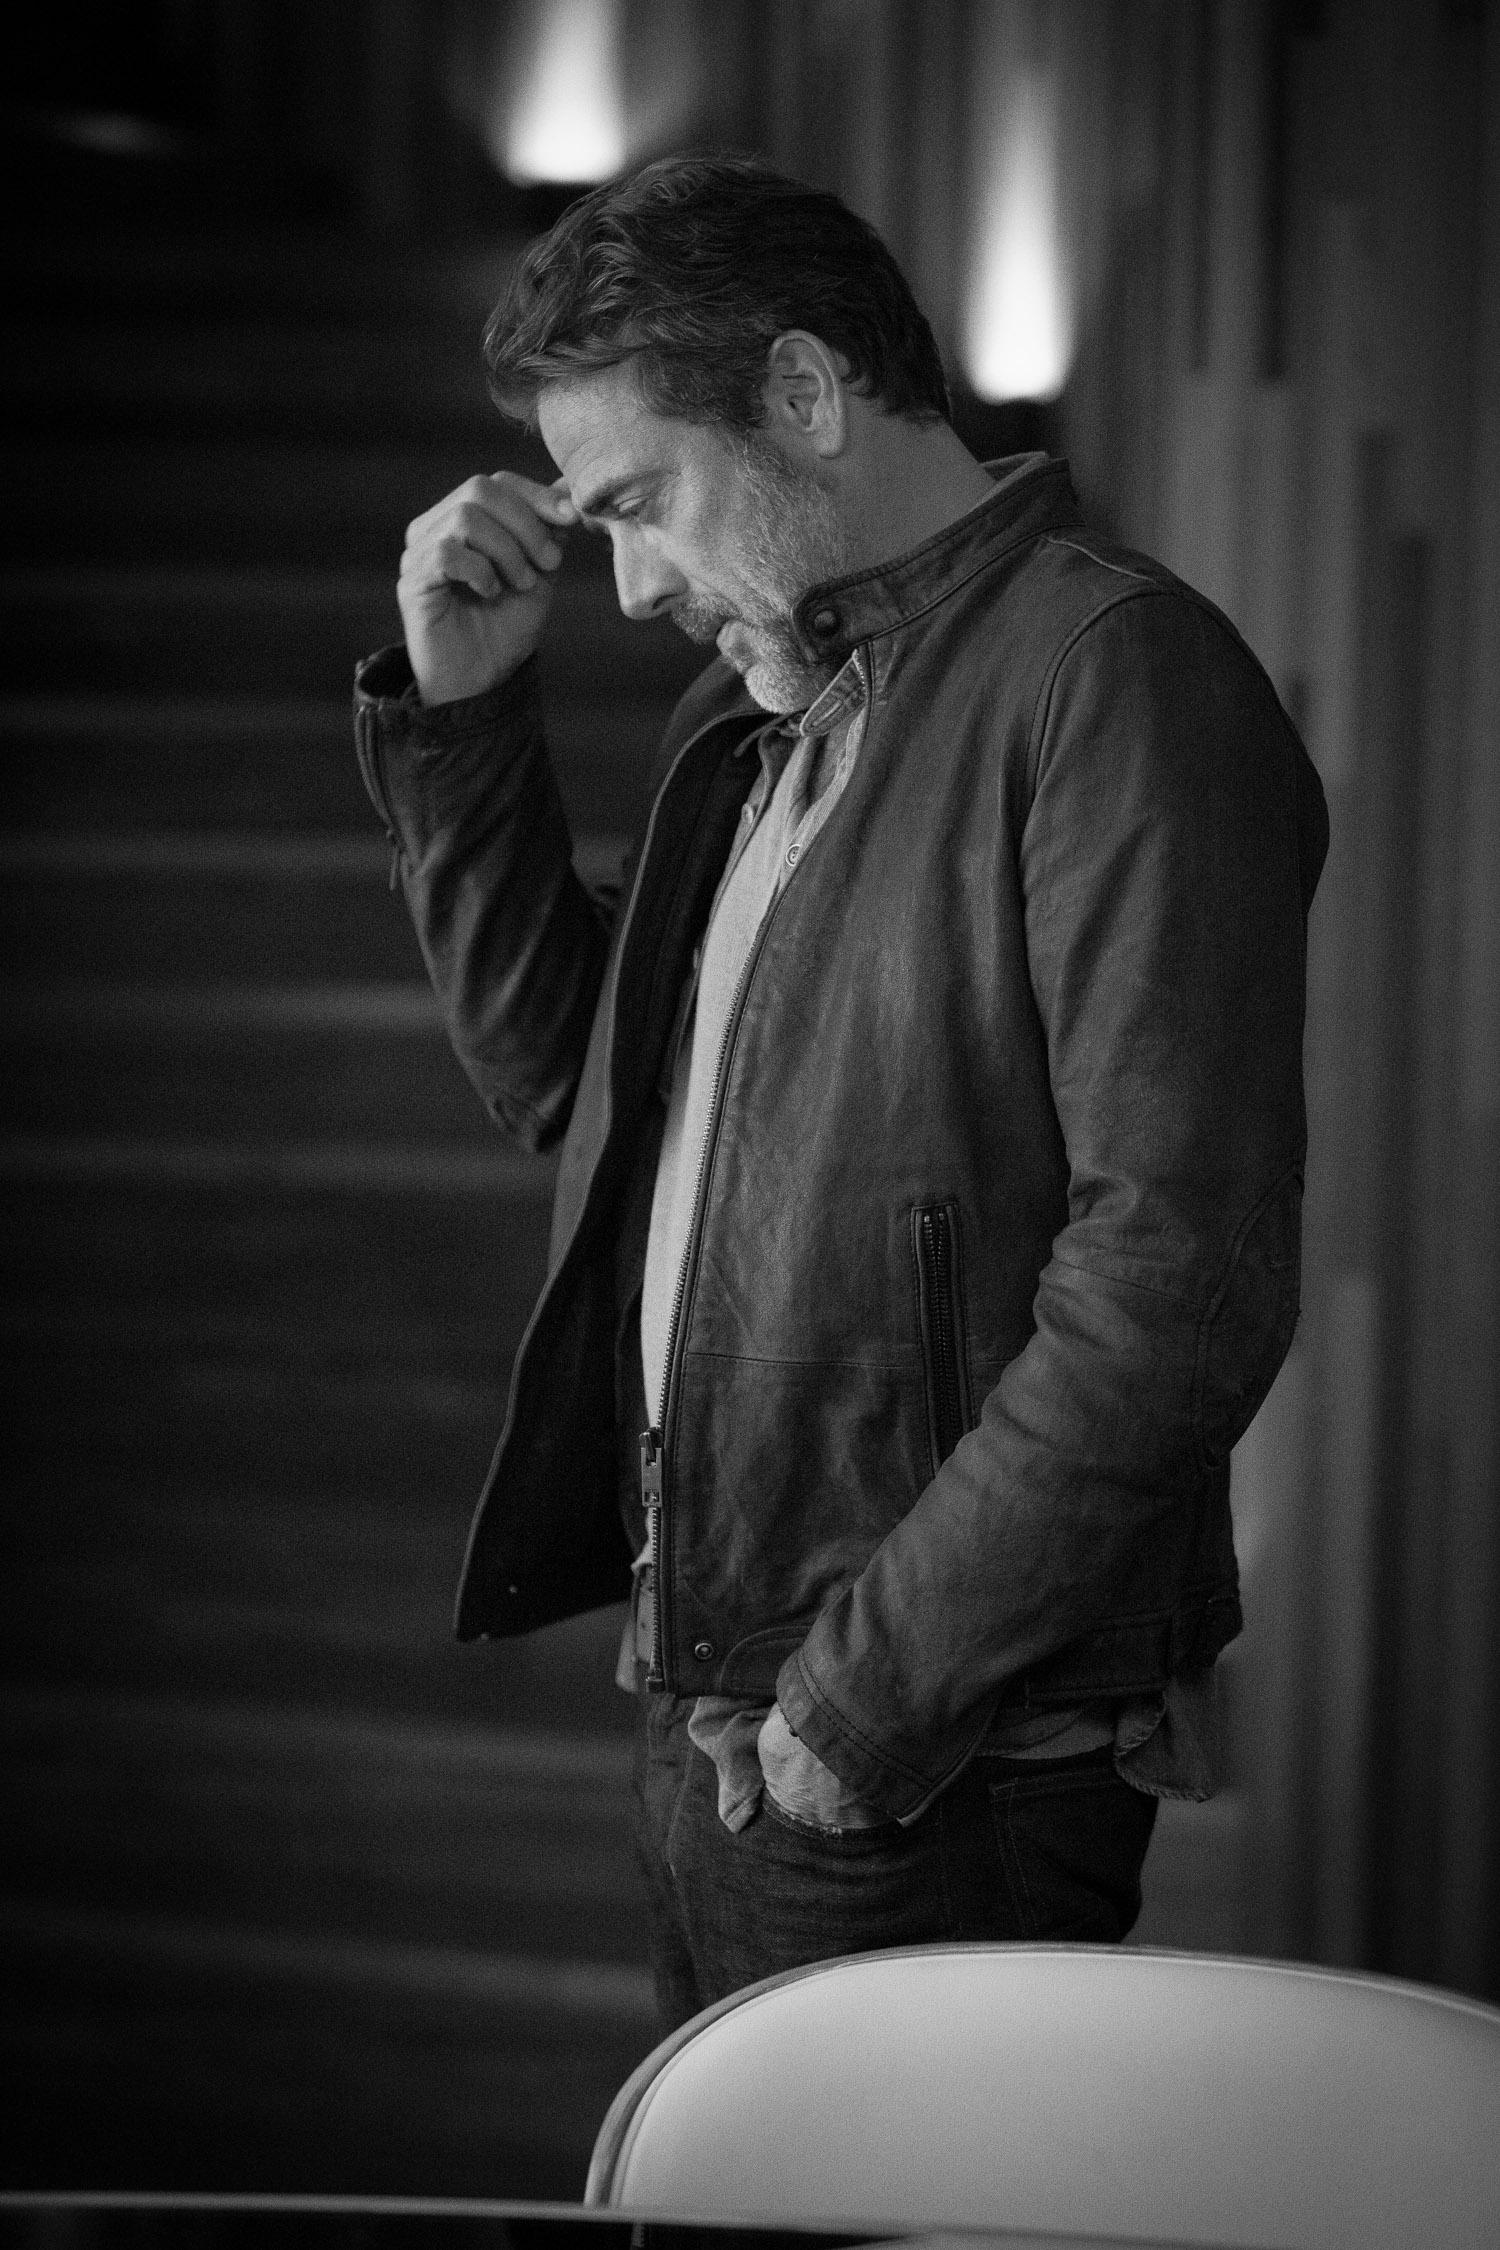 Jeffrey Dean Morgan gets into character.